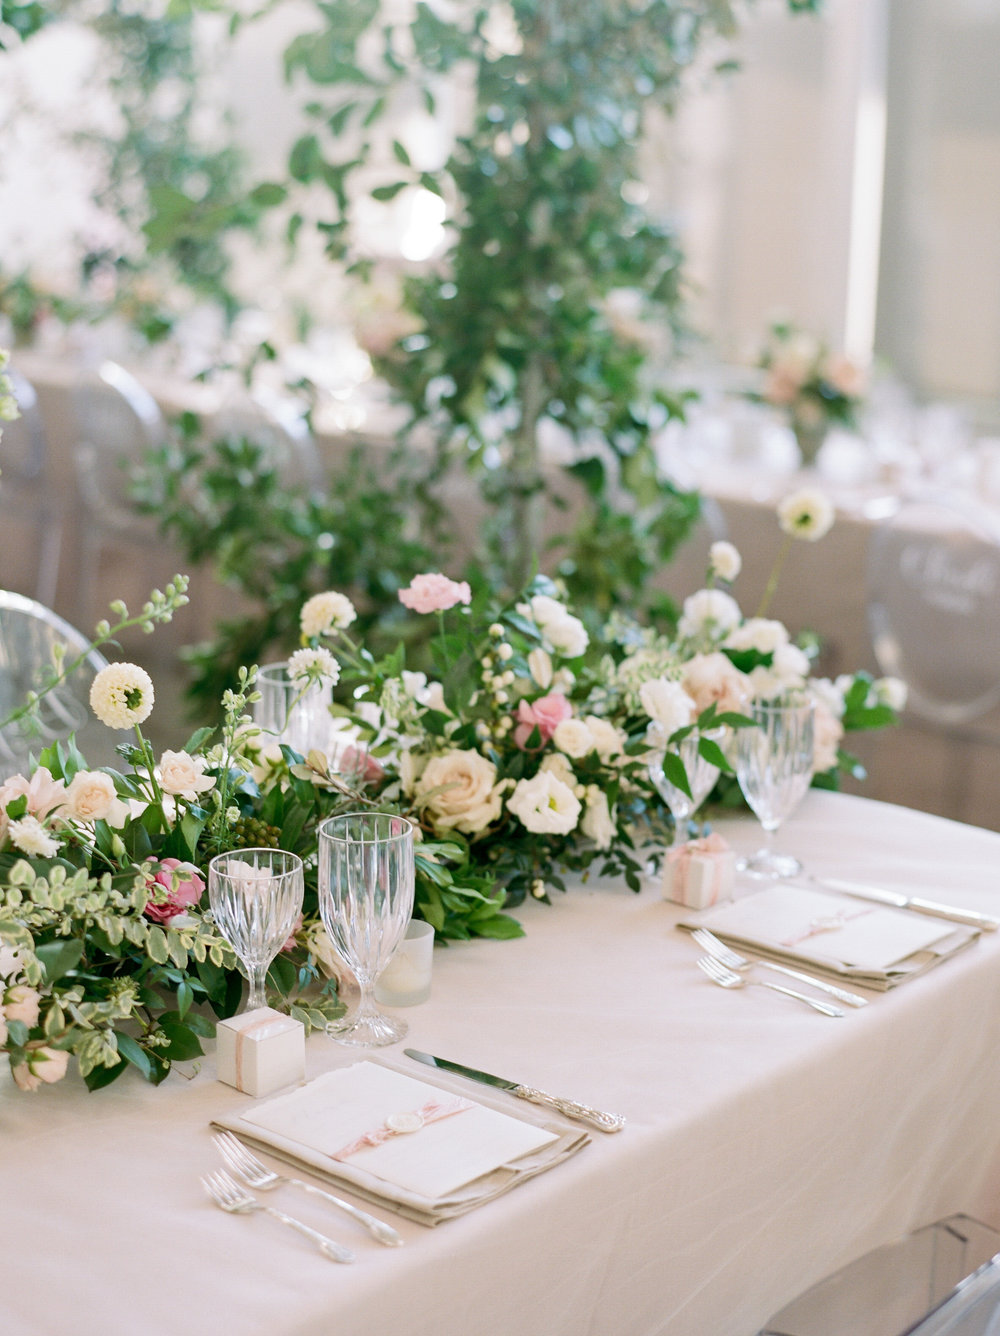 Martha-Stewart-Wedding-Dana-Fernandez-Photography-Josh-Texas-Film-Houston-Wedding-Fine-Art-Photographer-McGovern-Centennial-Gardens-Top-Best-47.jpg